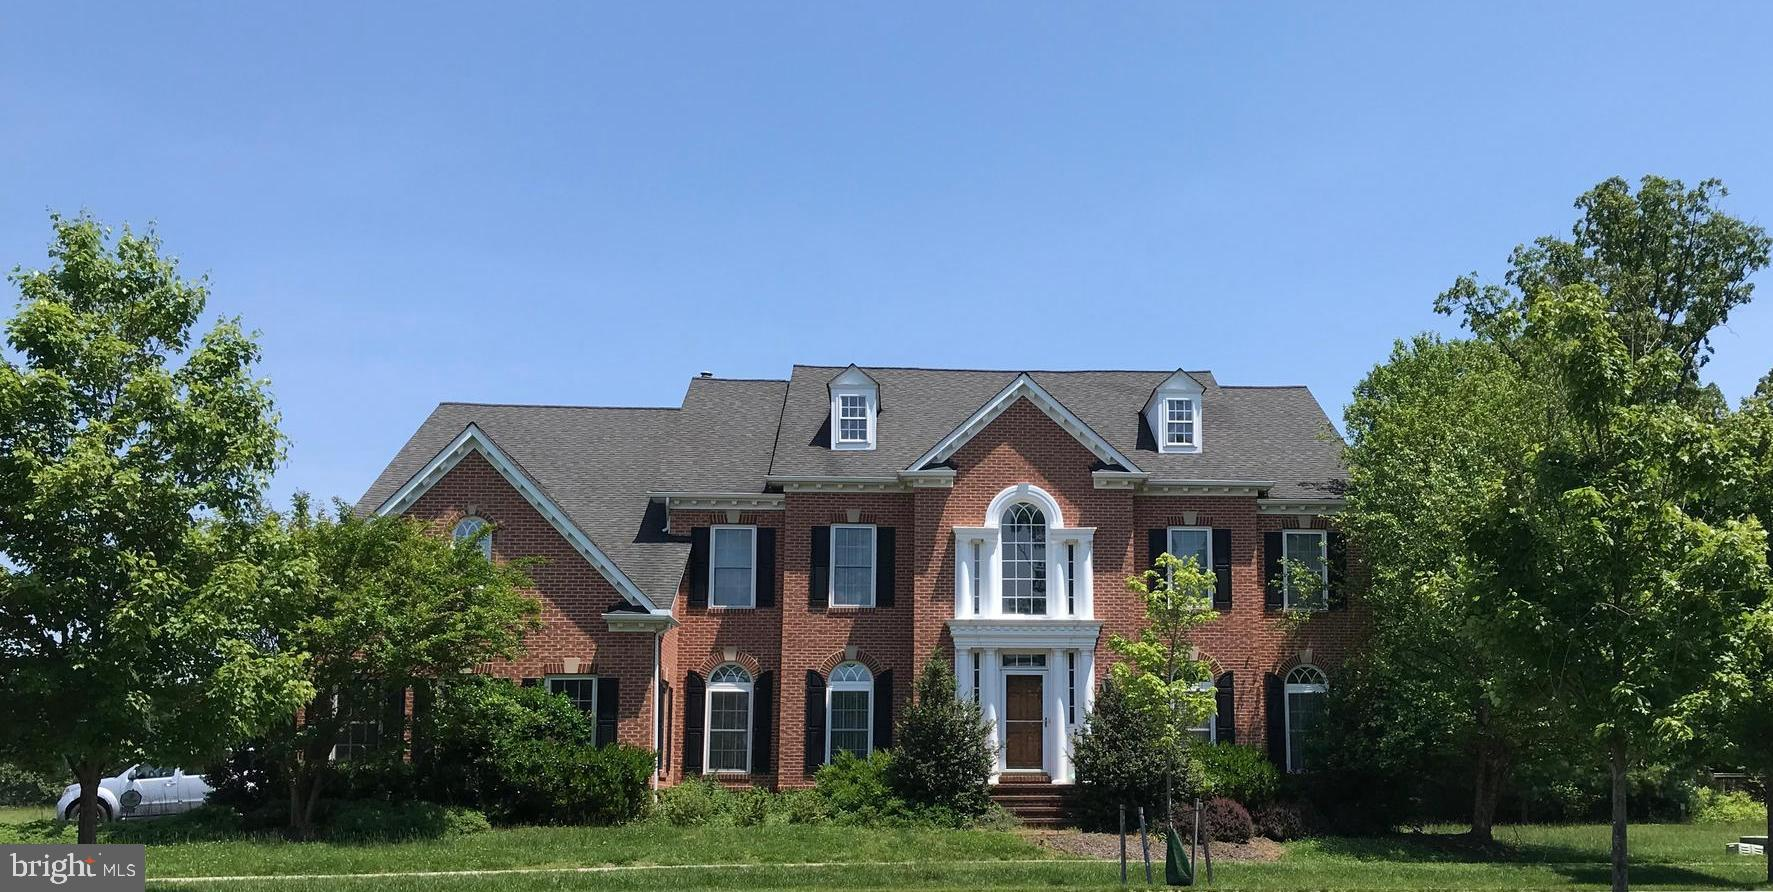 11221 GREENBRIAR PRESERVE Ln, Potomac, MD, 20854